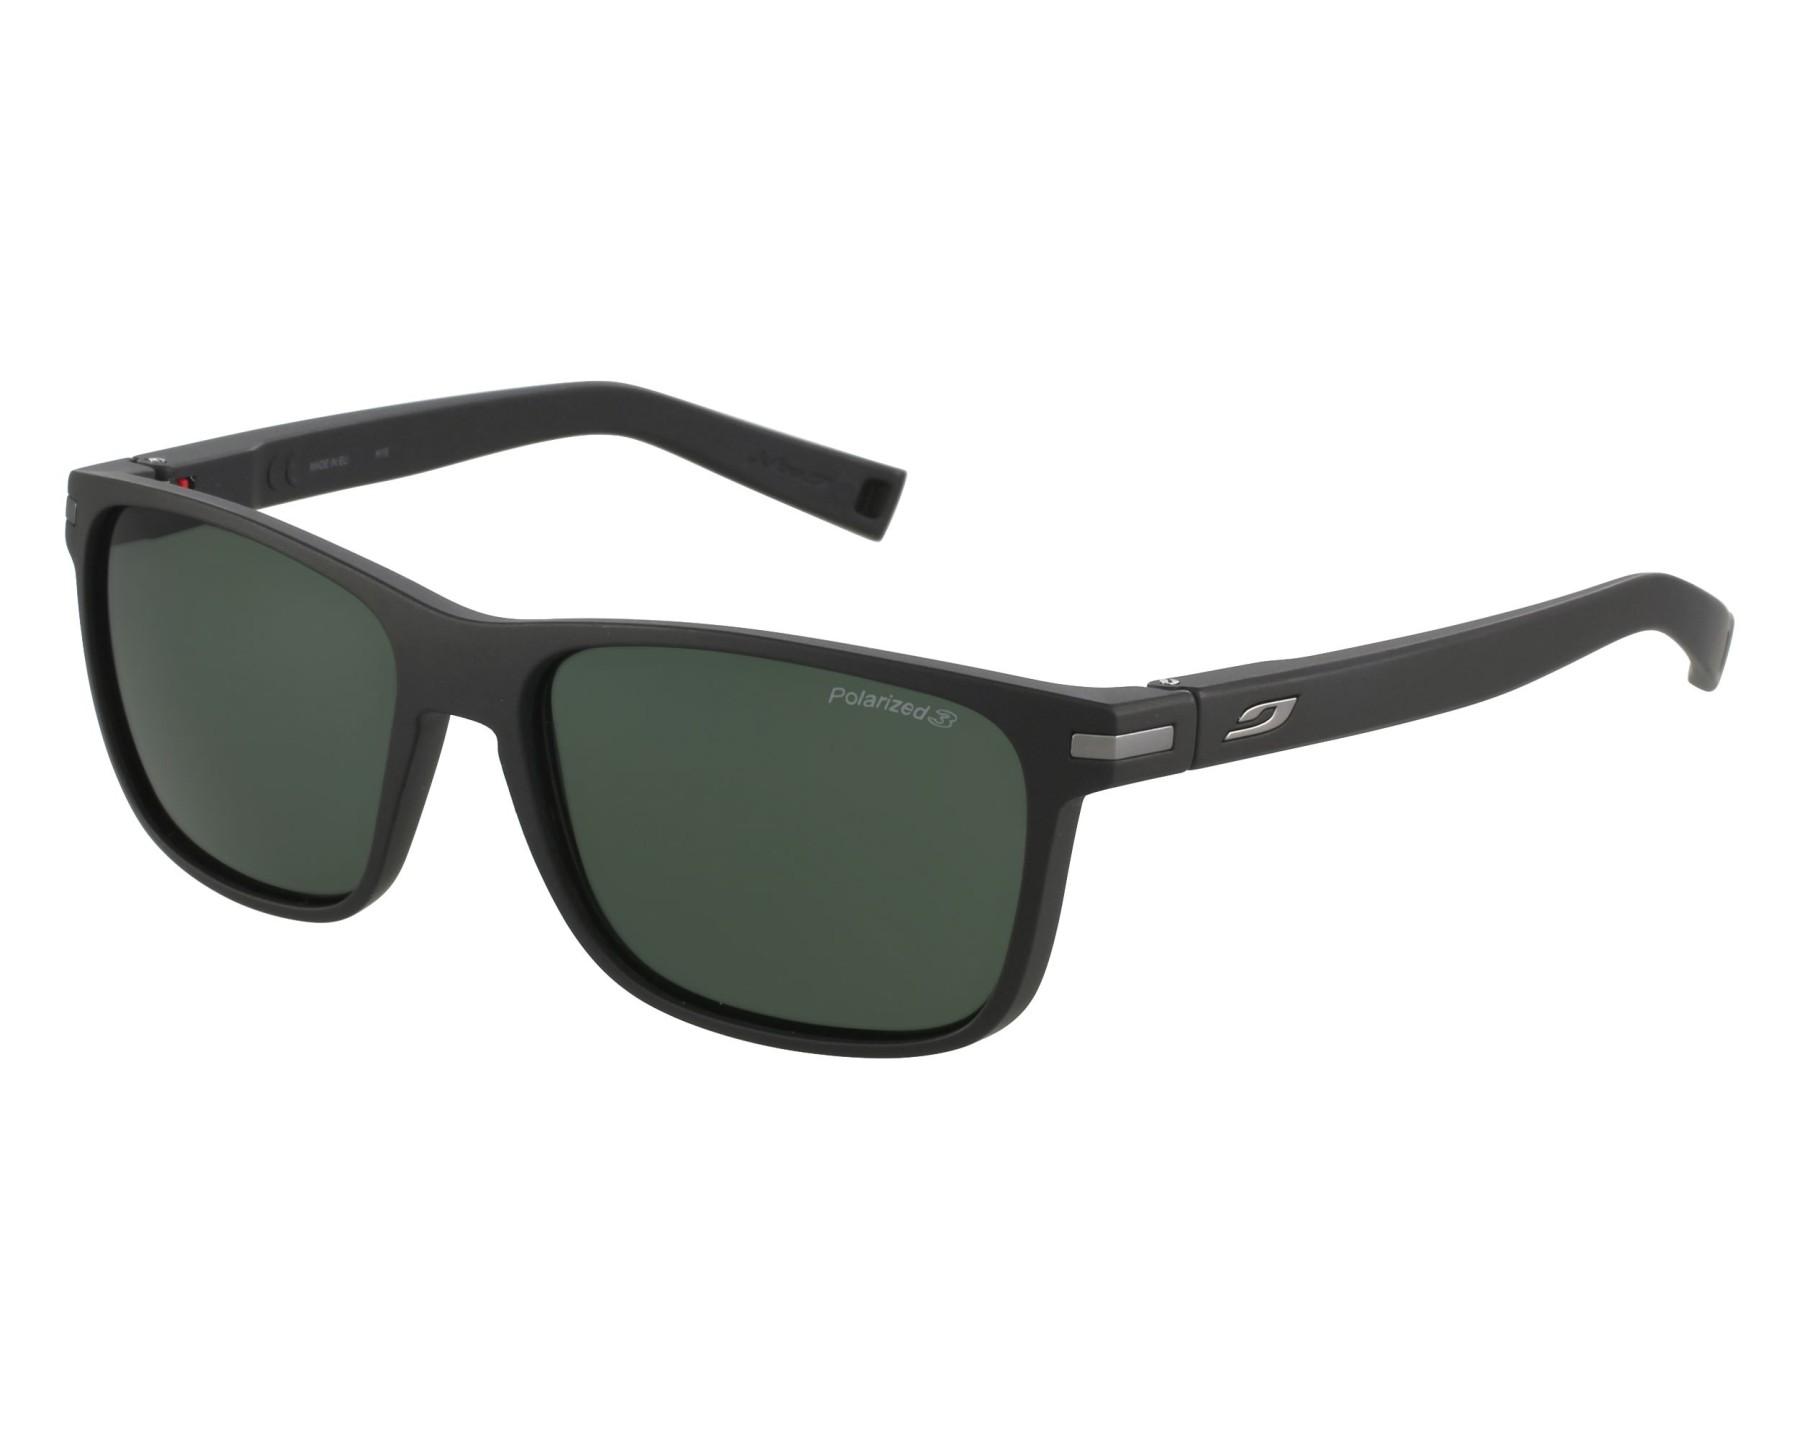 38b905b850d Sunglasses Julbo J481 9014 47-17 Black front view